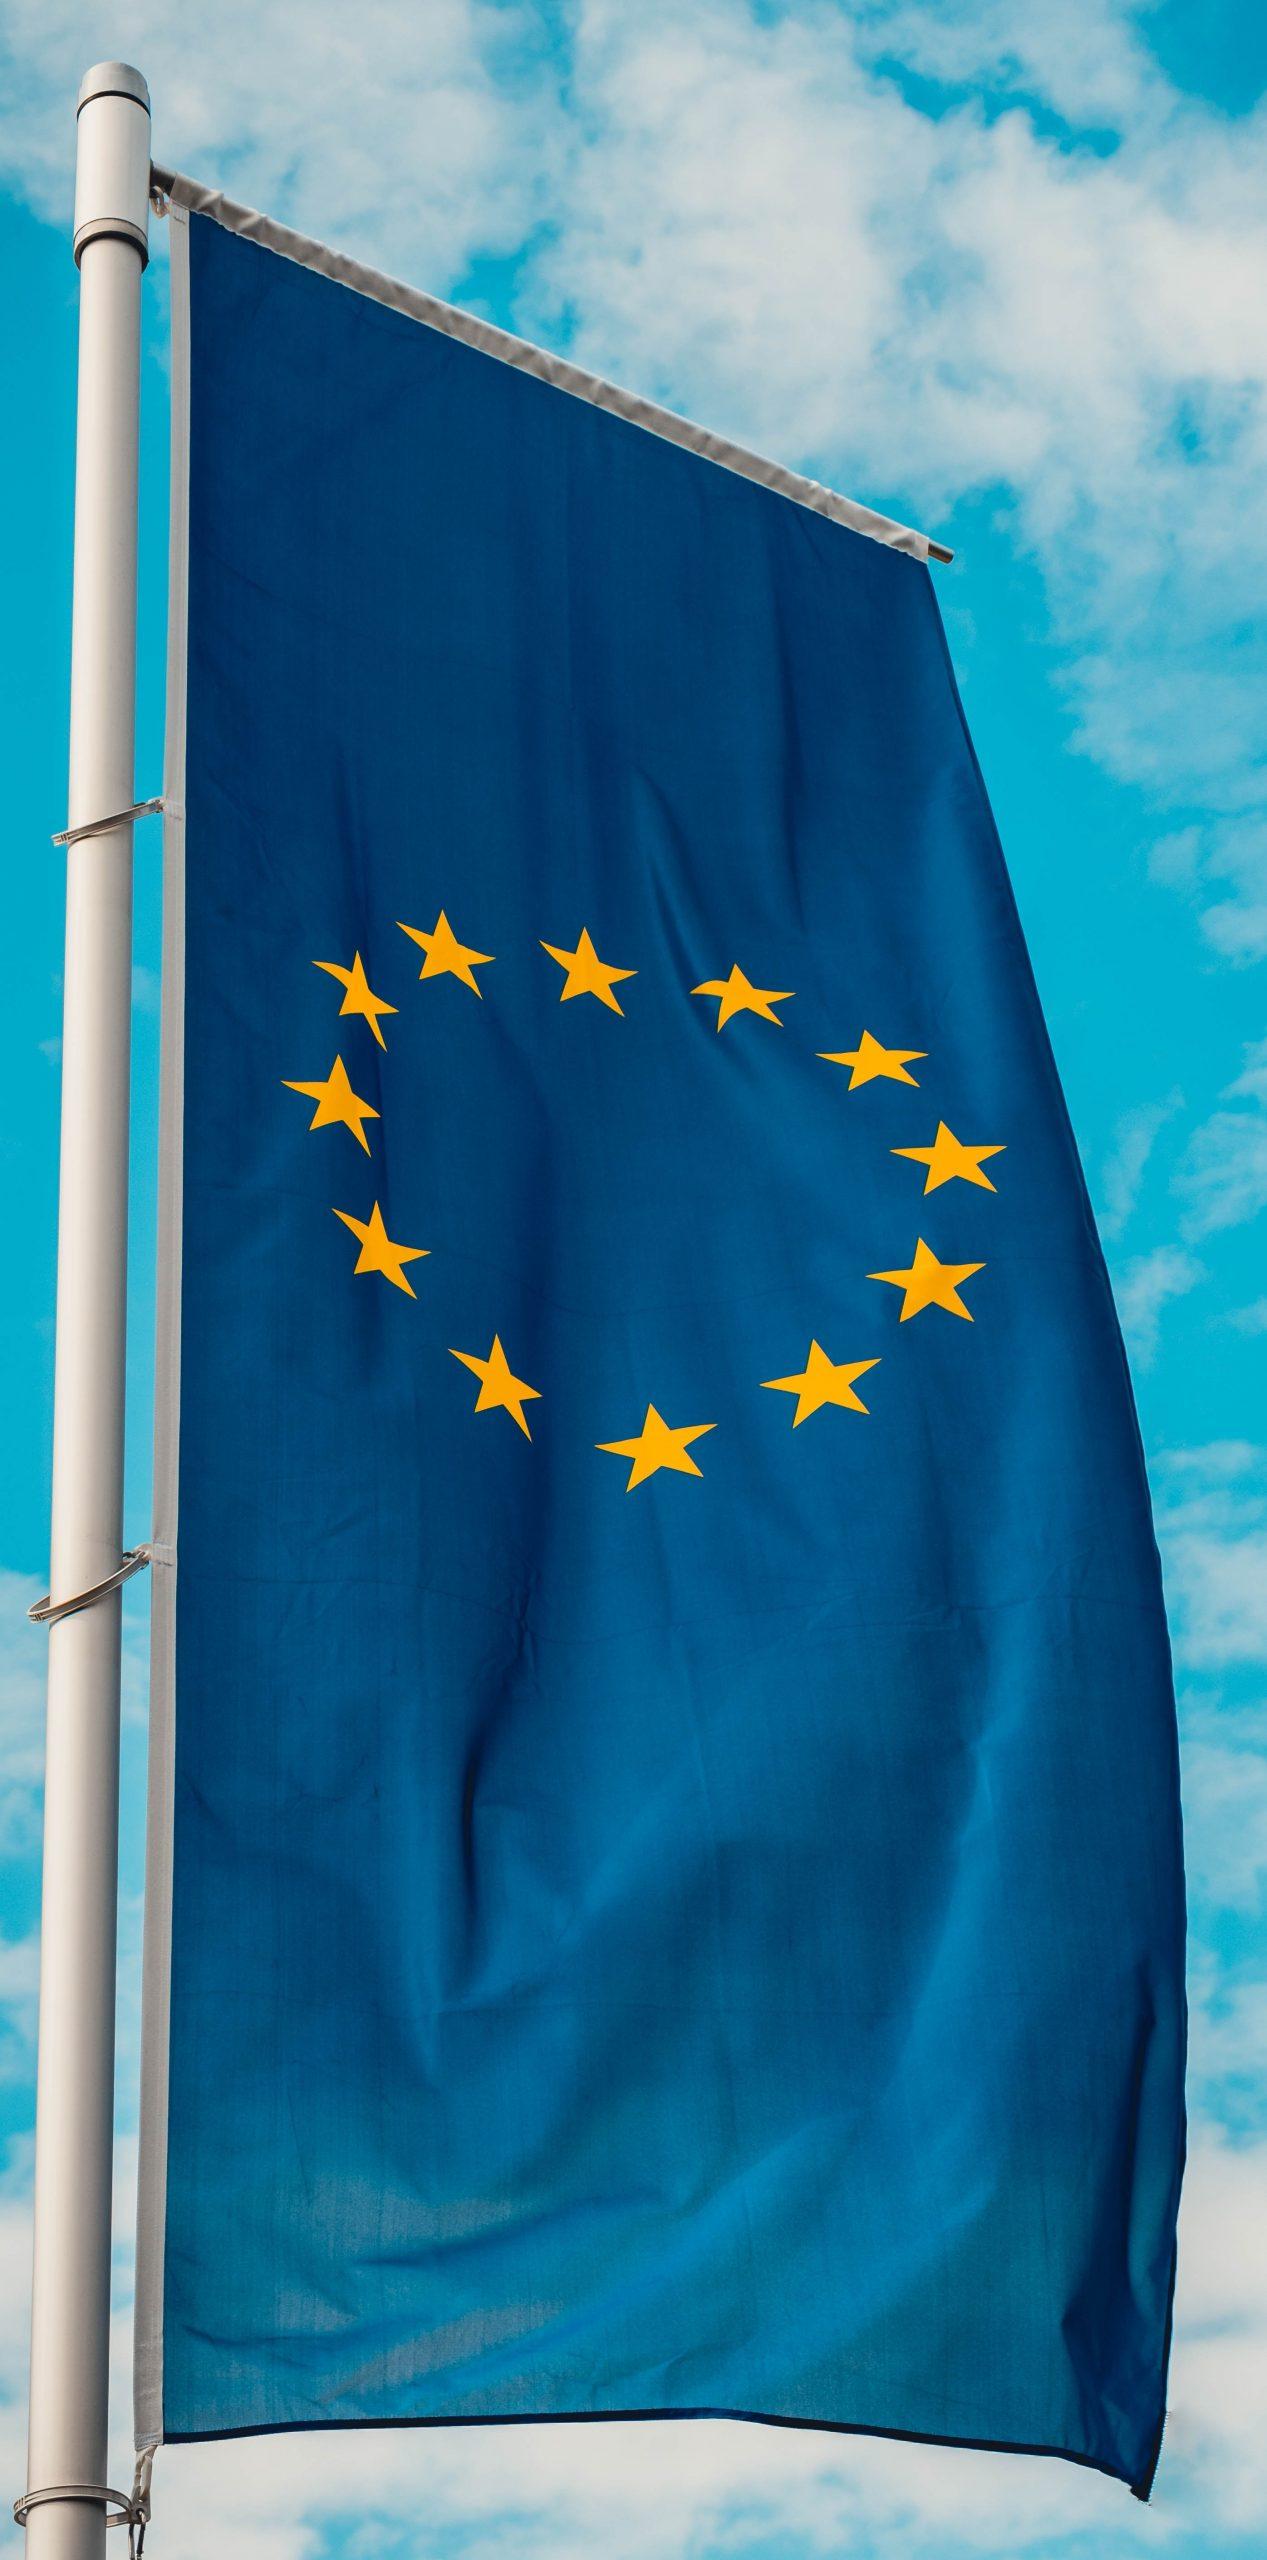 Annulation de nos projets européens